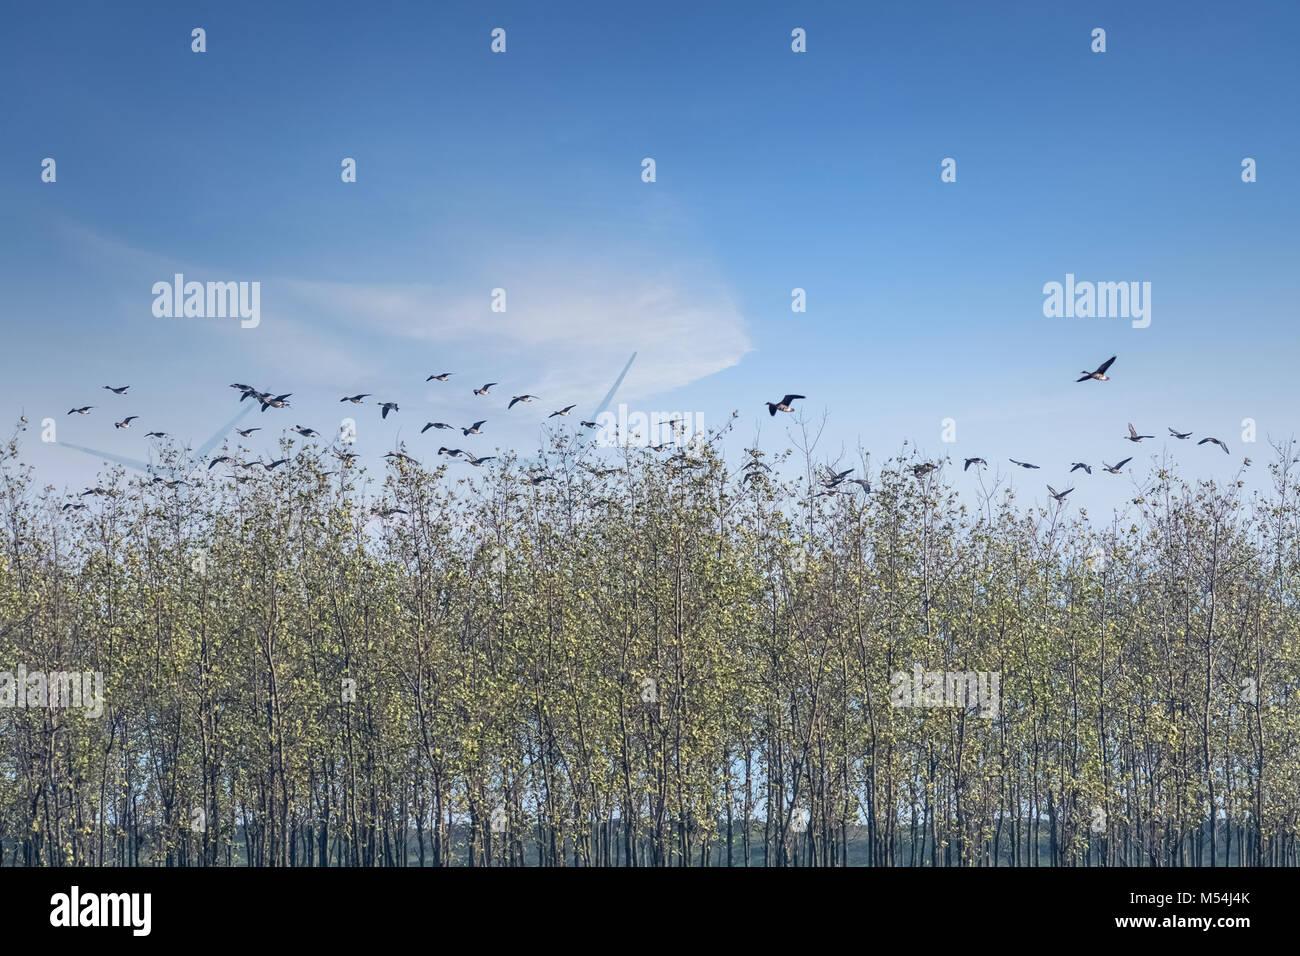 poyang lake migratory bird reserve landscape - Stock Image